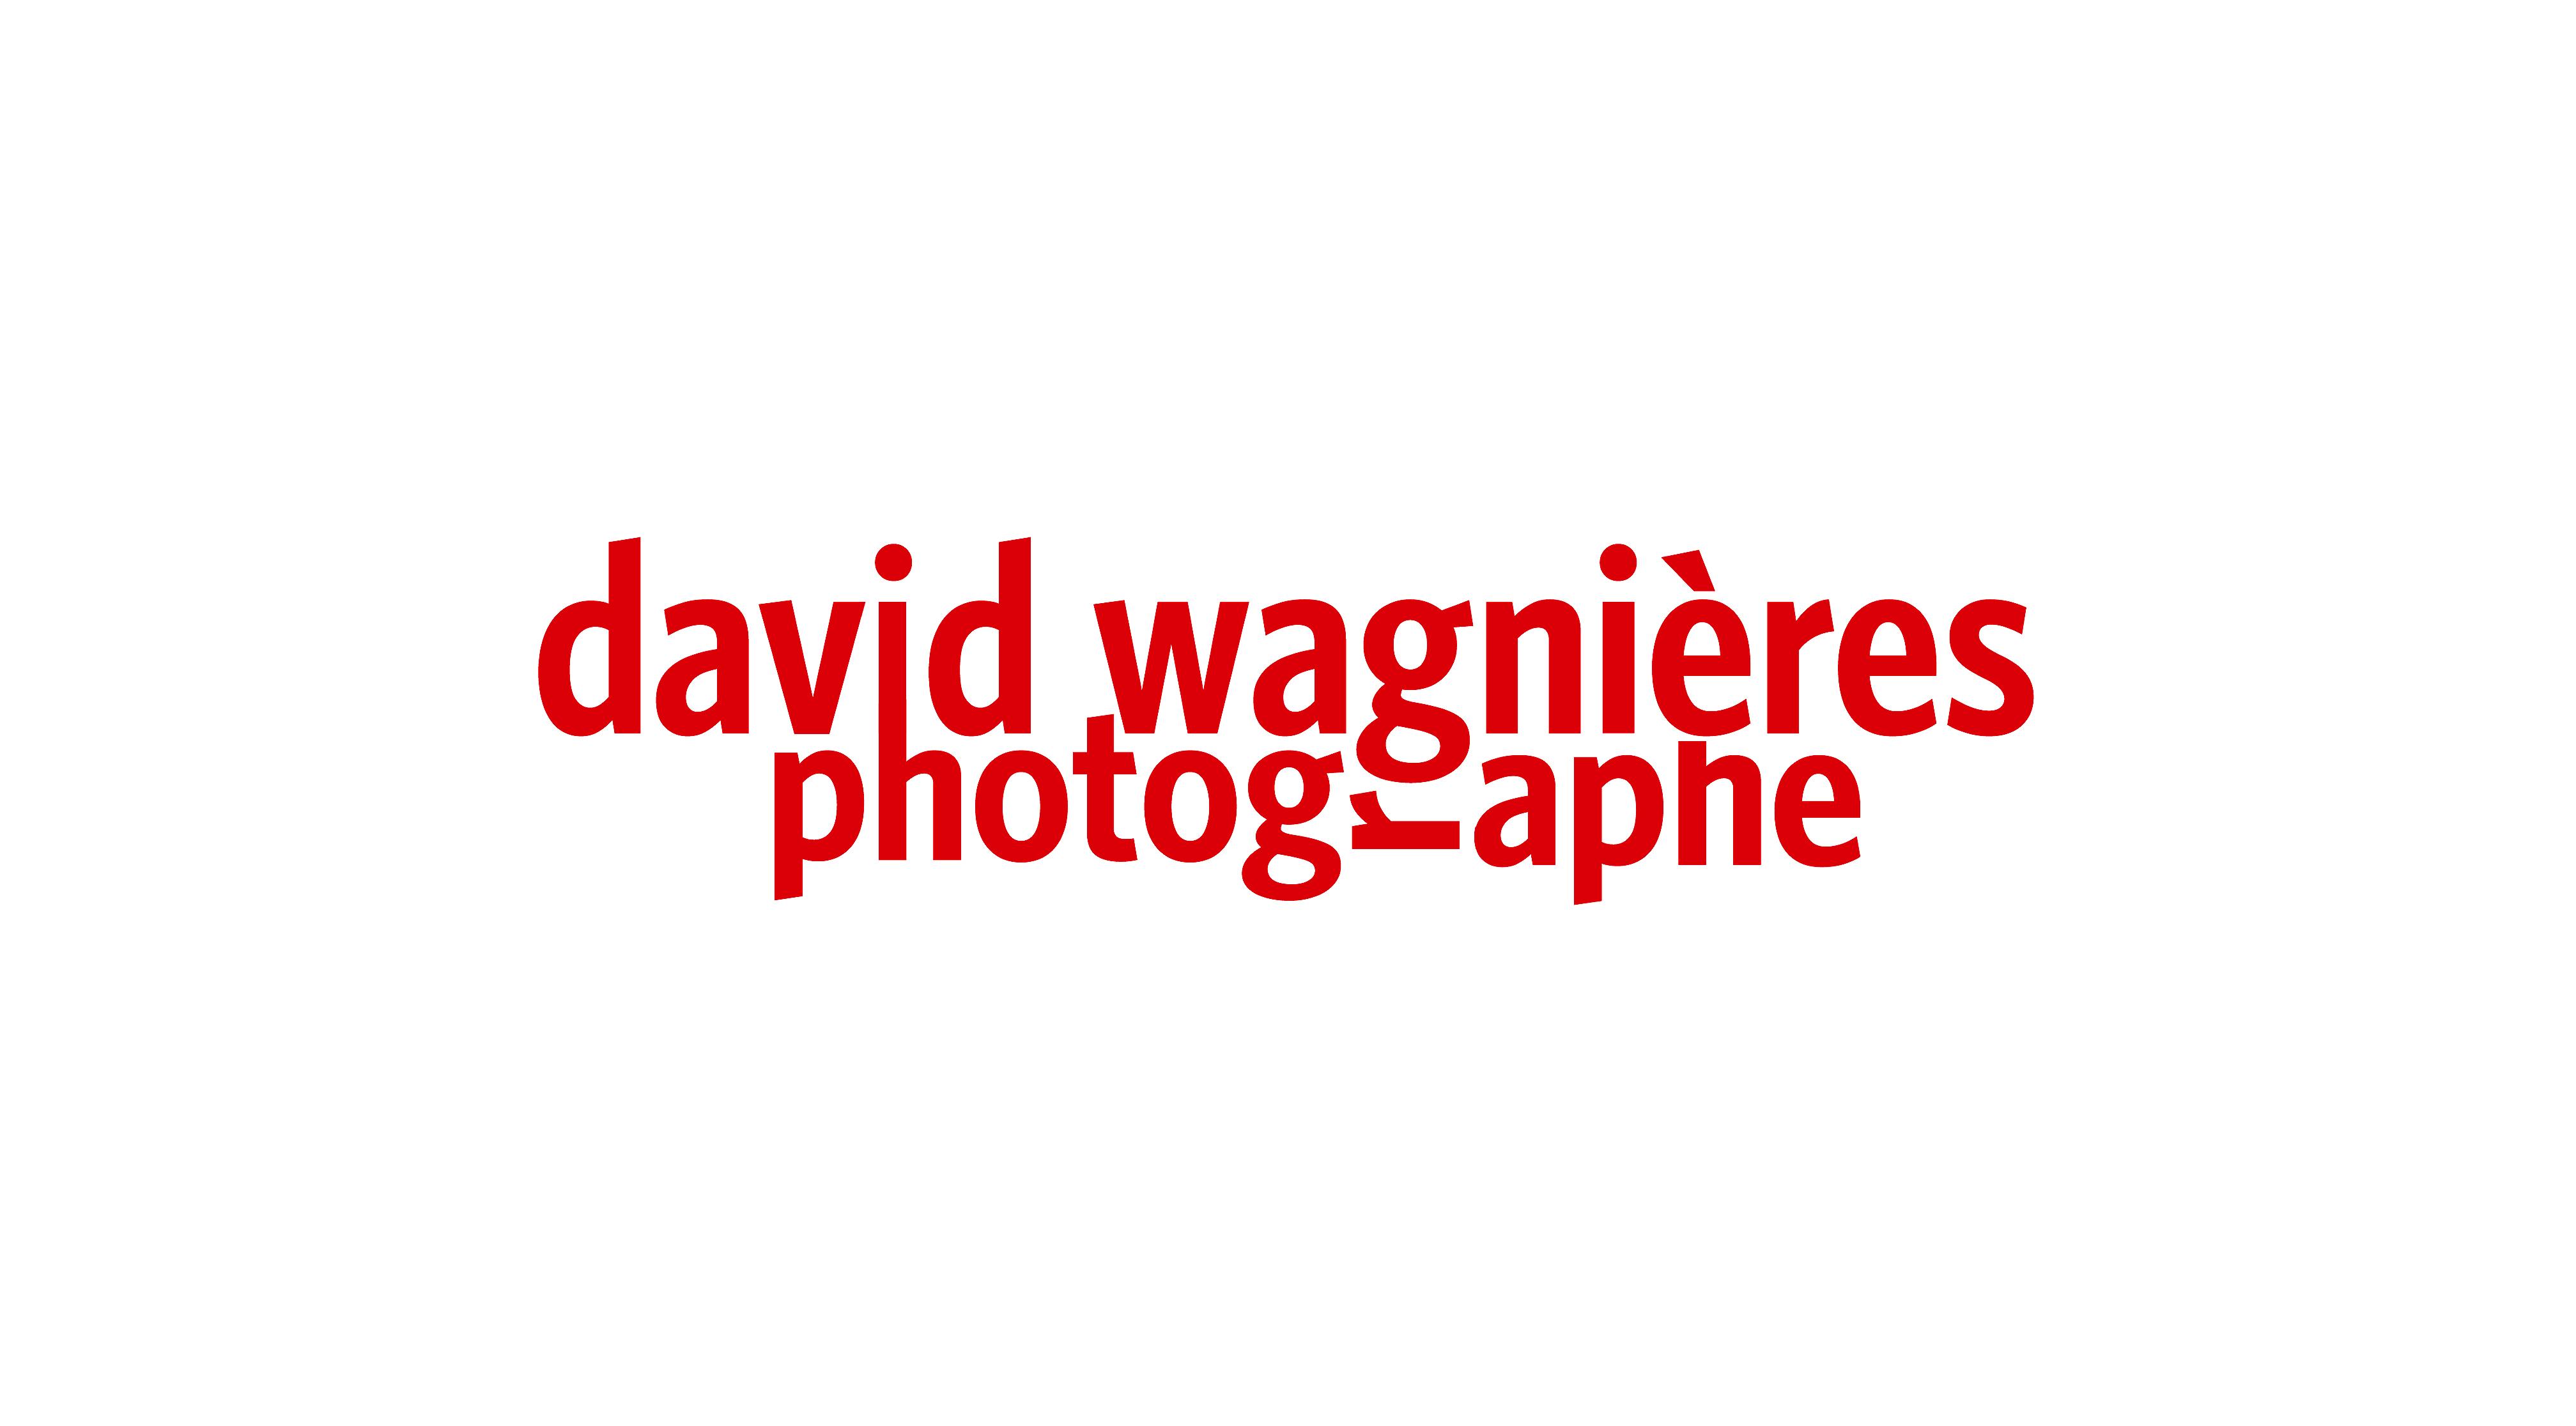 logo_david_wagnieres